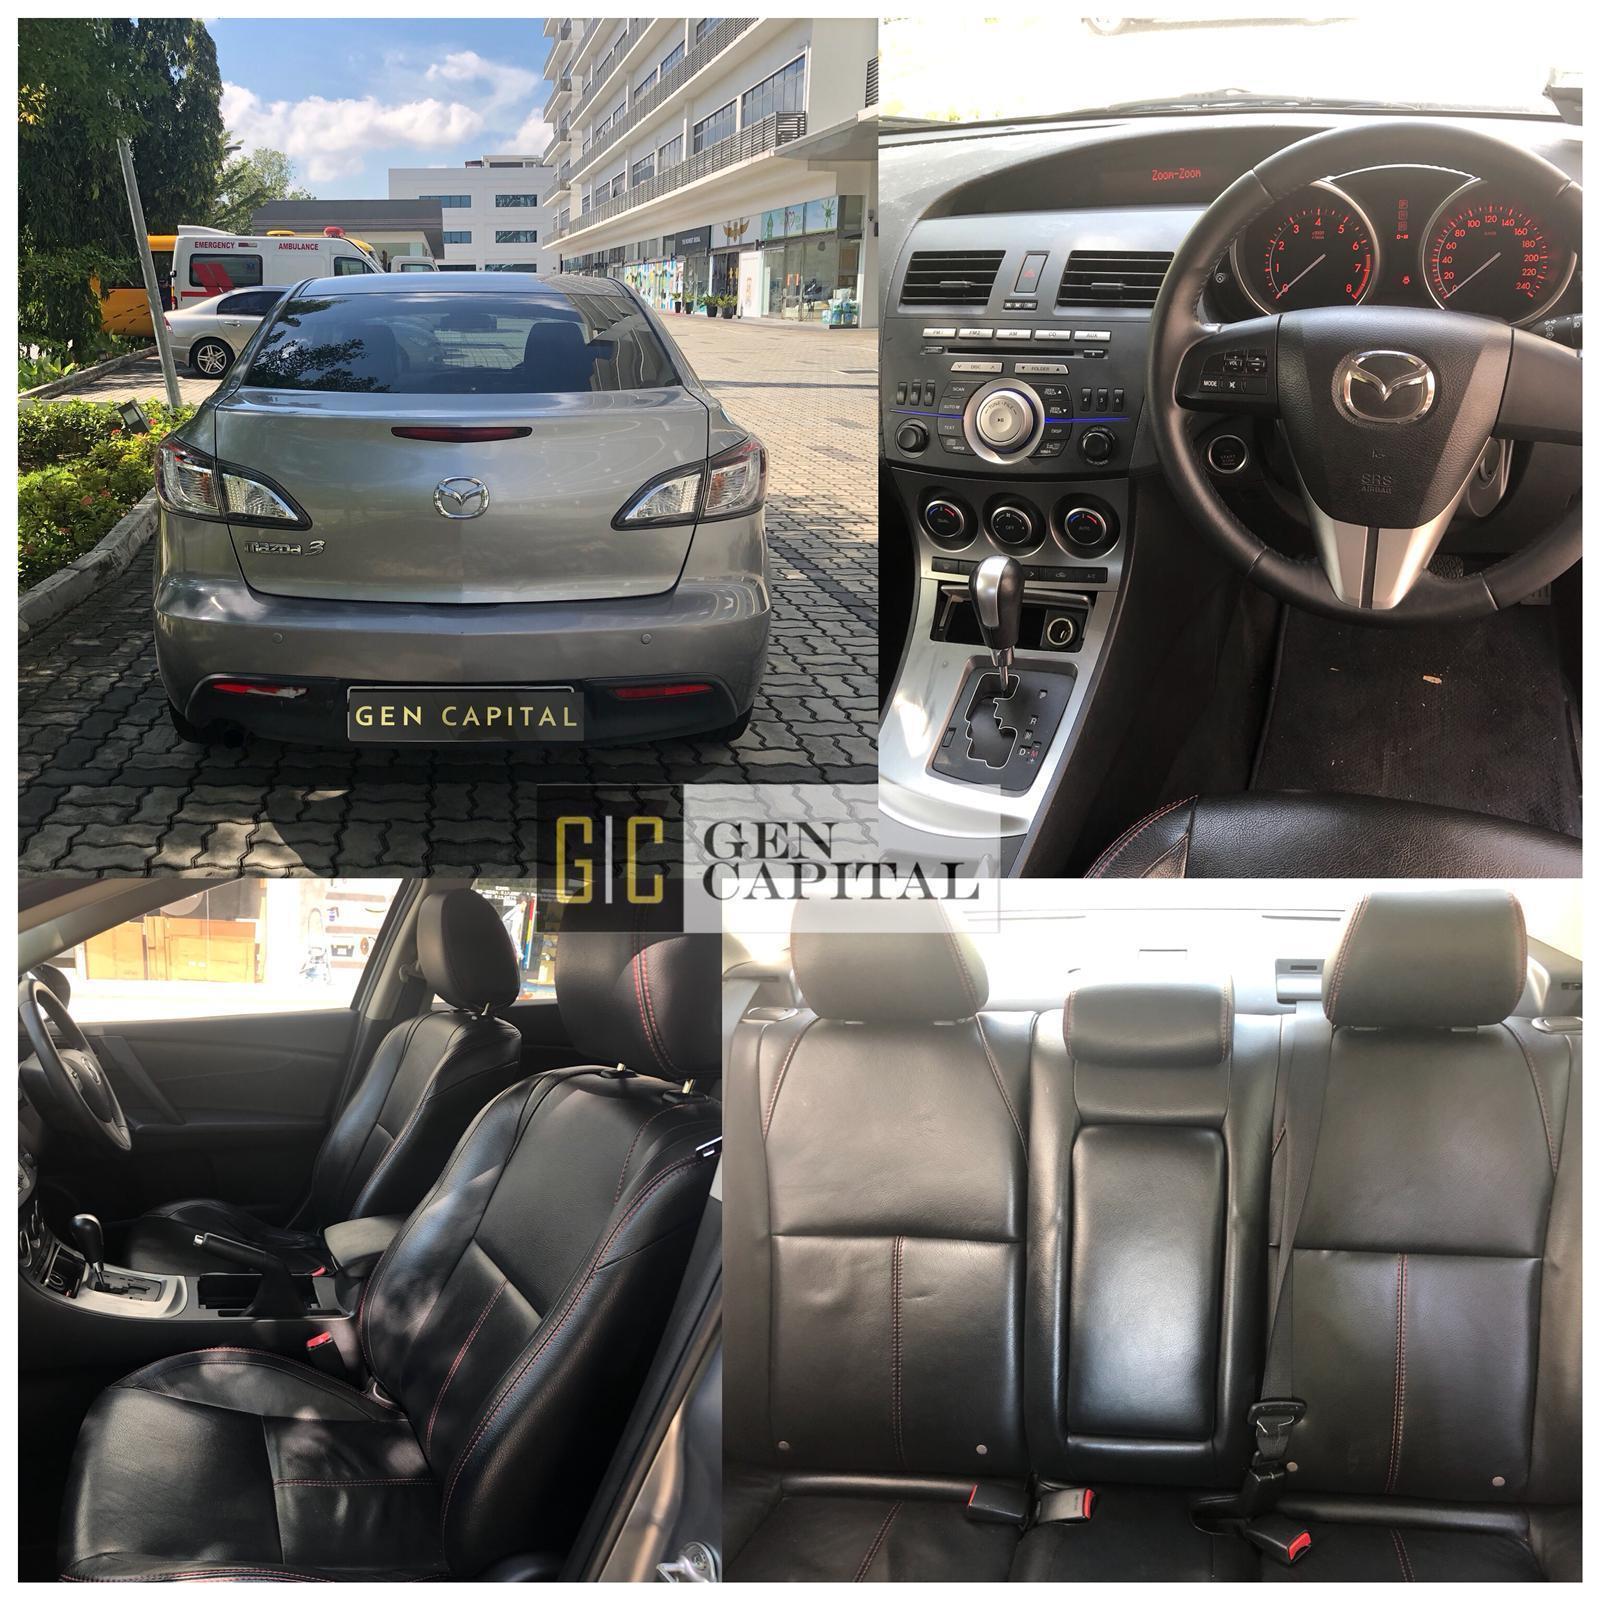 Mazda 3 Luxury 1.6A Grab Gojek Ryde Tada & Non PHV Car Rental Services in Singapore!